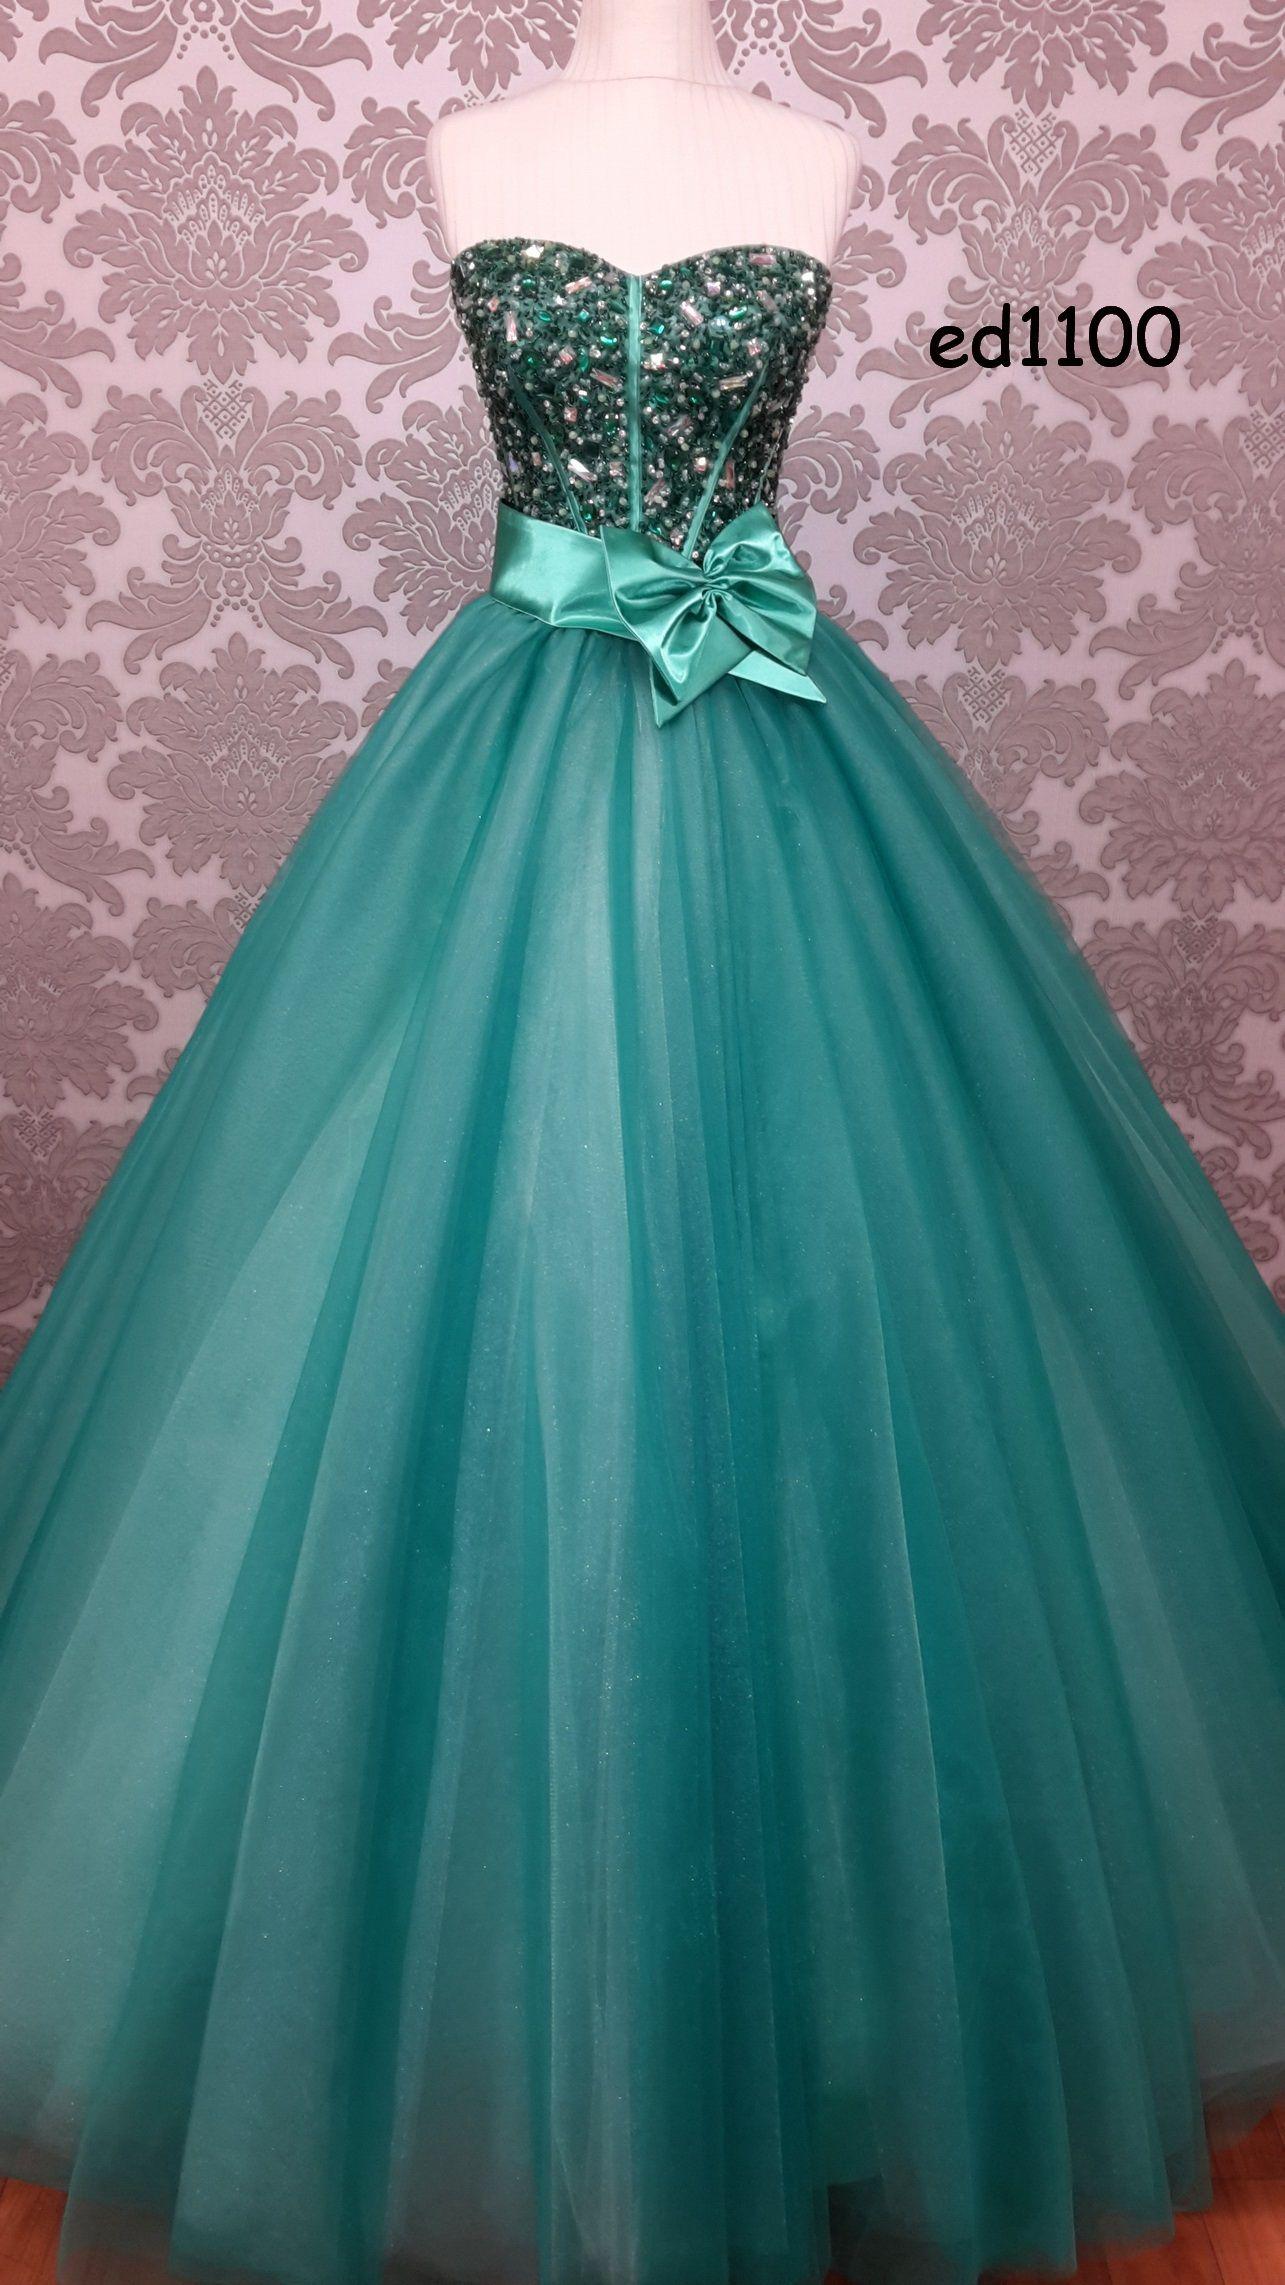 ED1100- Green Engagement Dress | Wedding Dresses, Evening Dresses ...